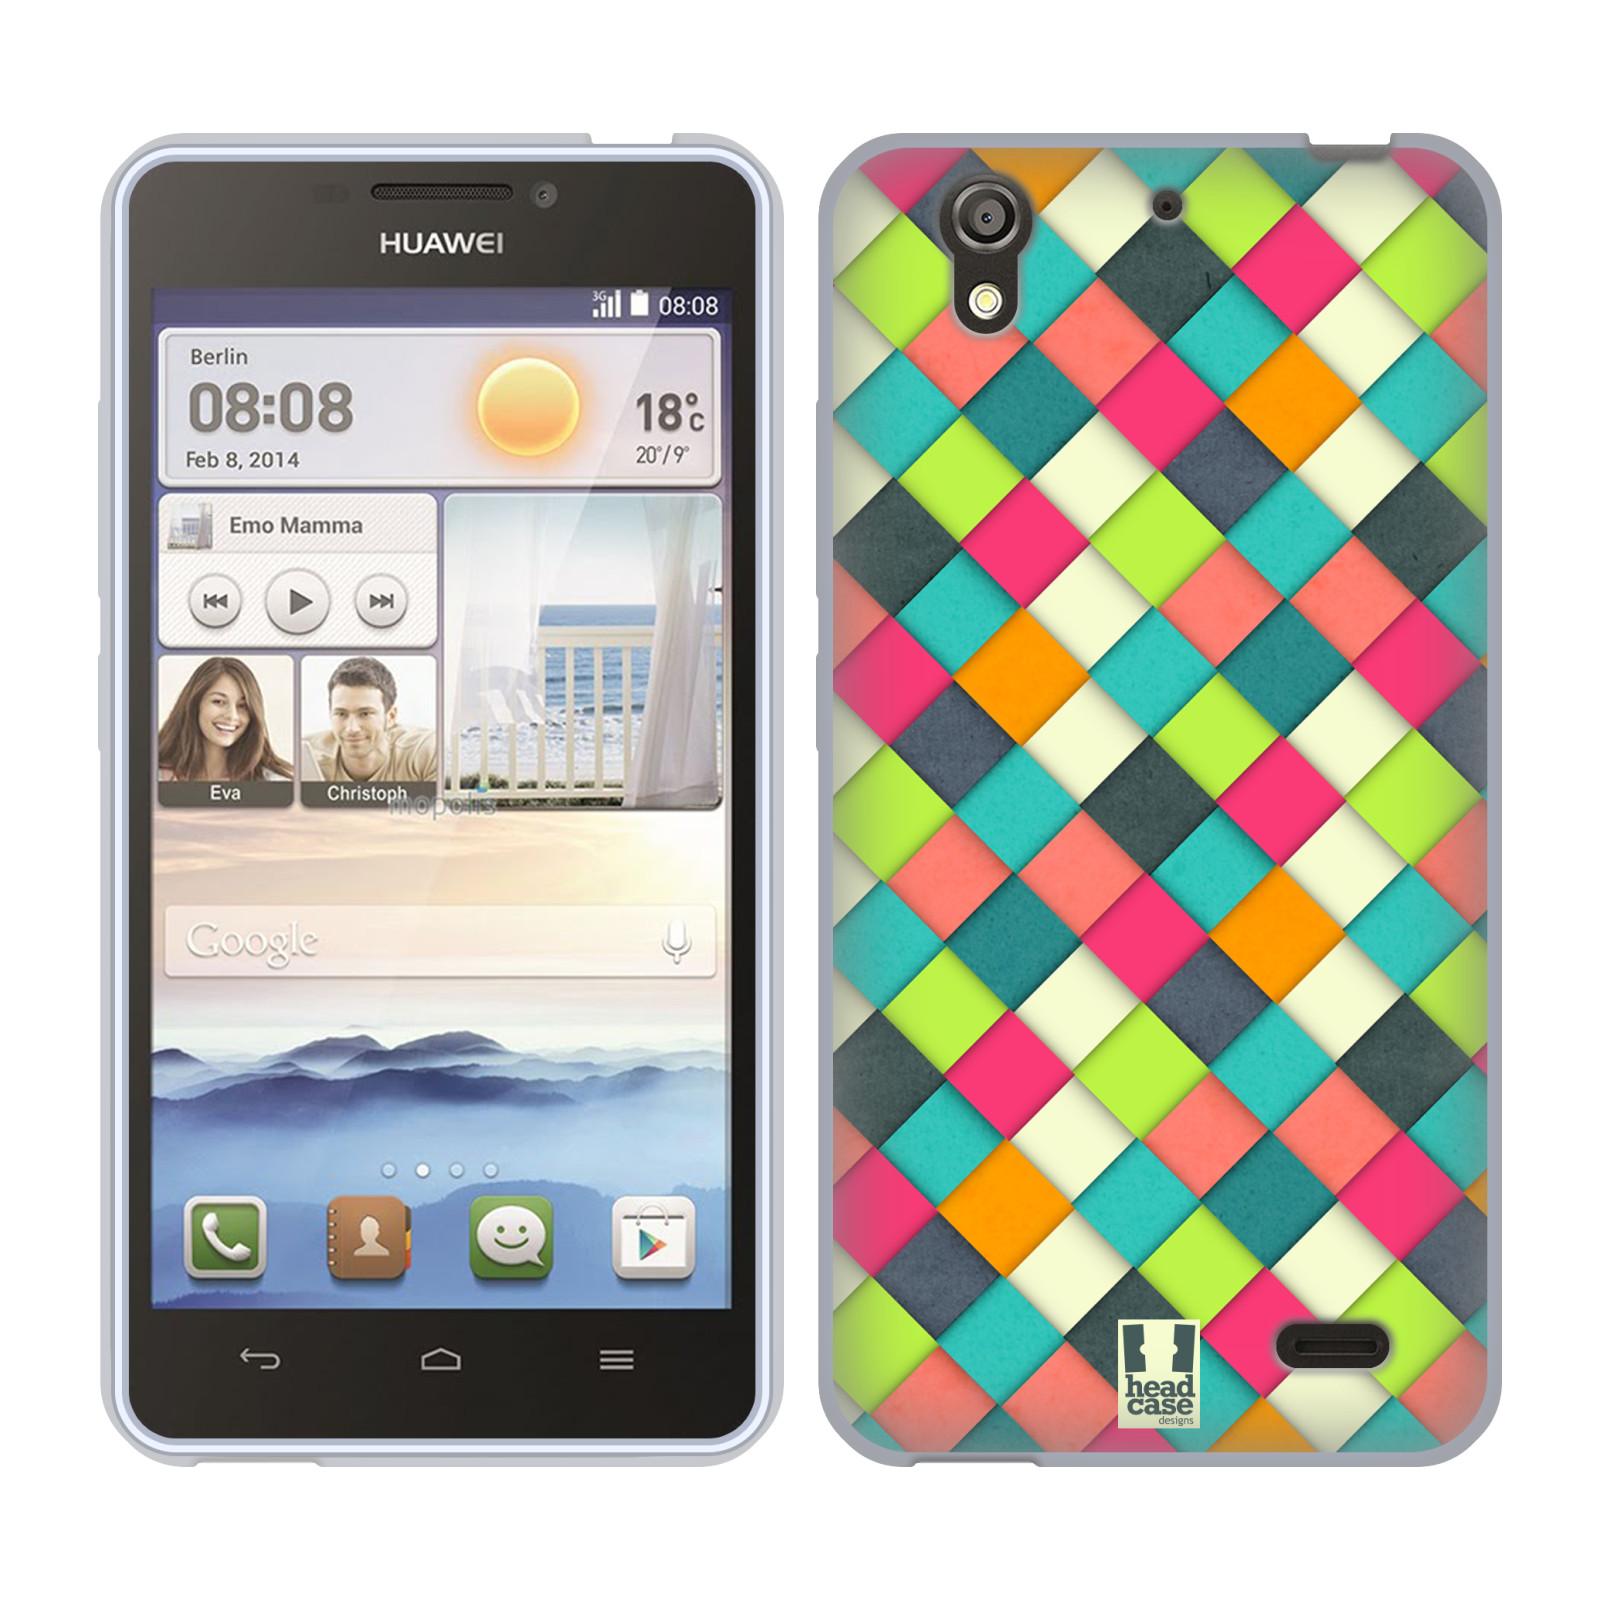 Silikonové pouzdro na mobil Huawei Ascend Y530 HEAD CASE WOVEN (Silikonový kryt či obal na mobilní telefon Huawei Ascend Y530)